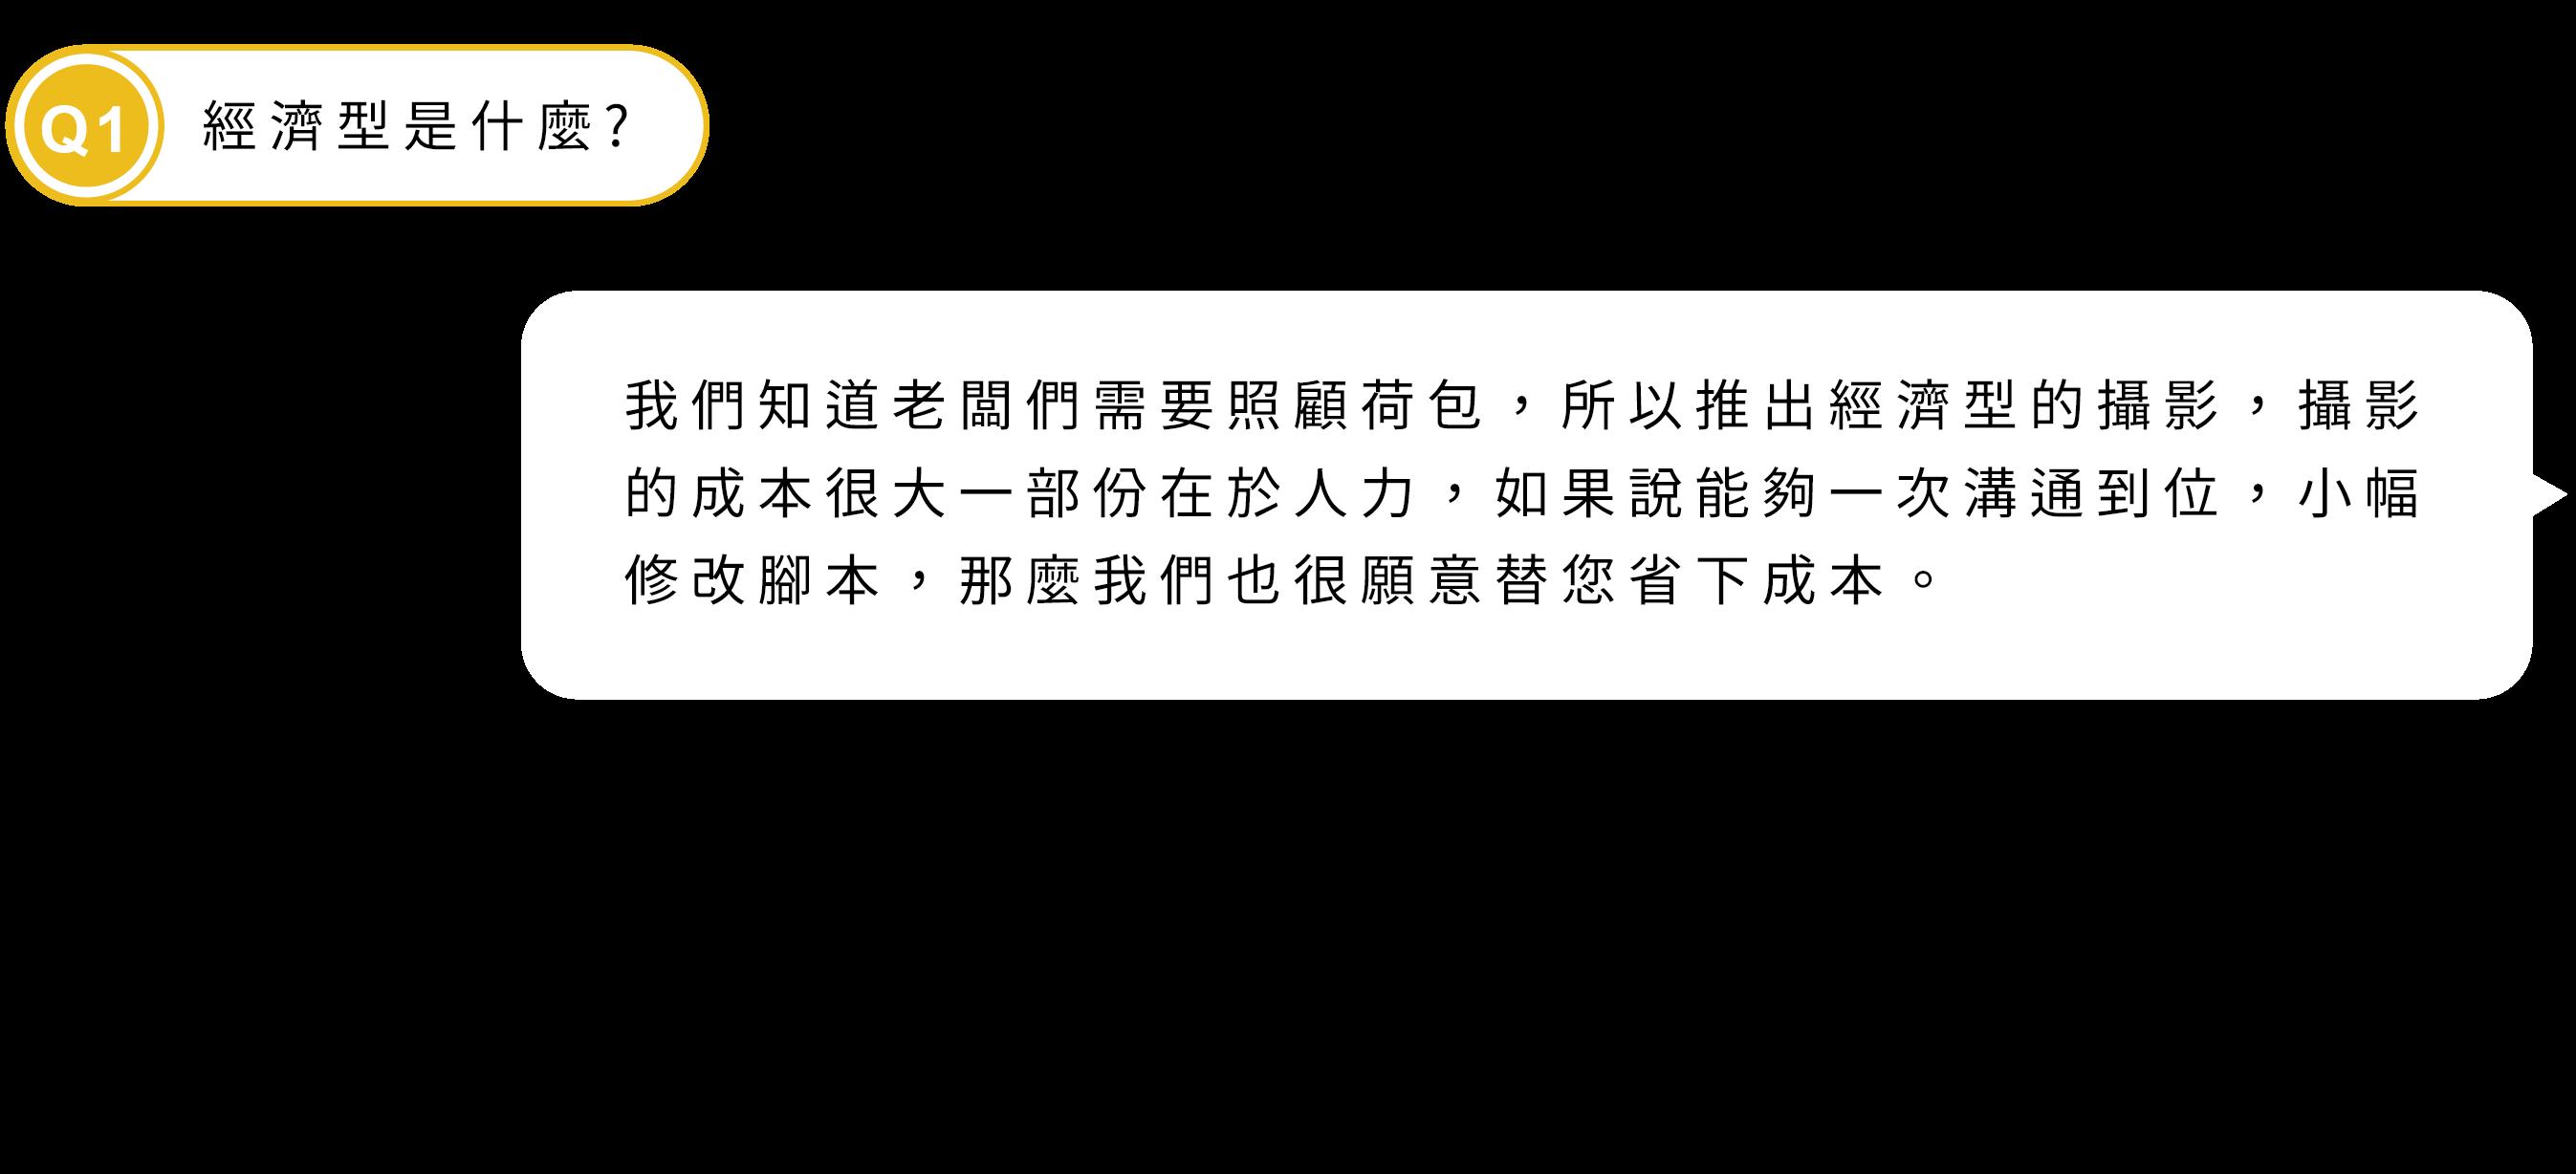 Q1-12